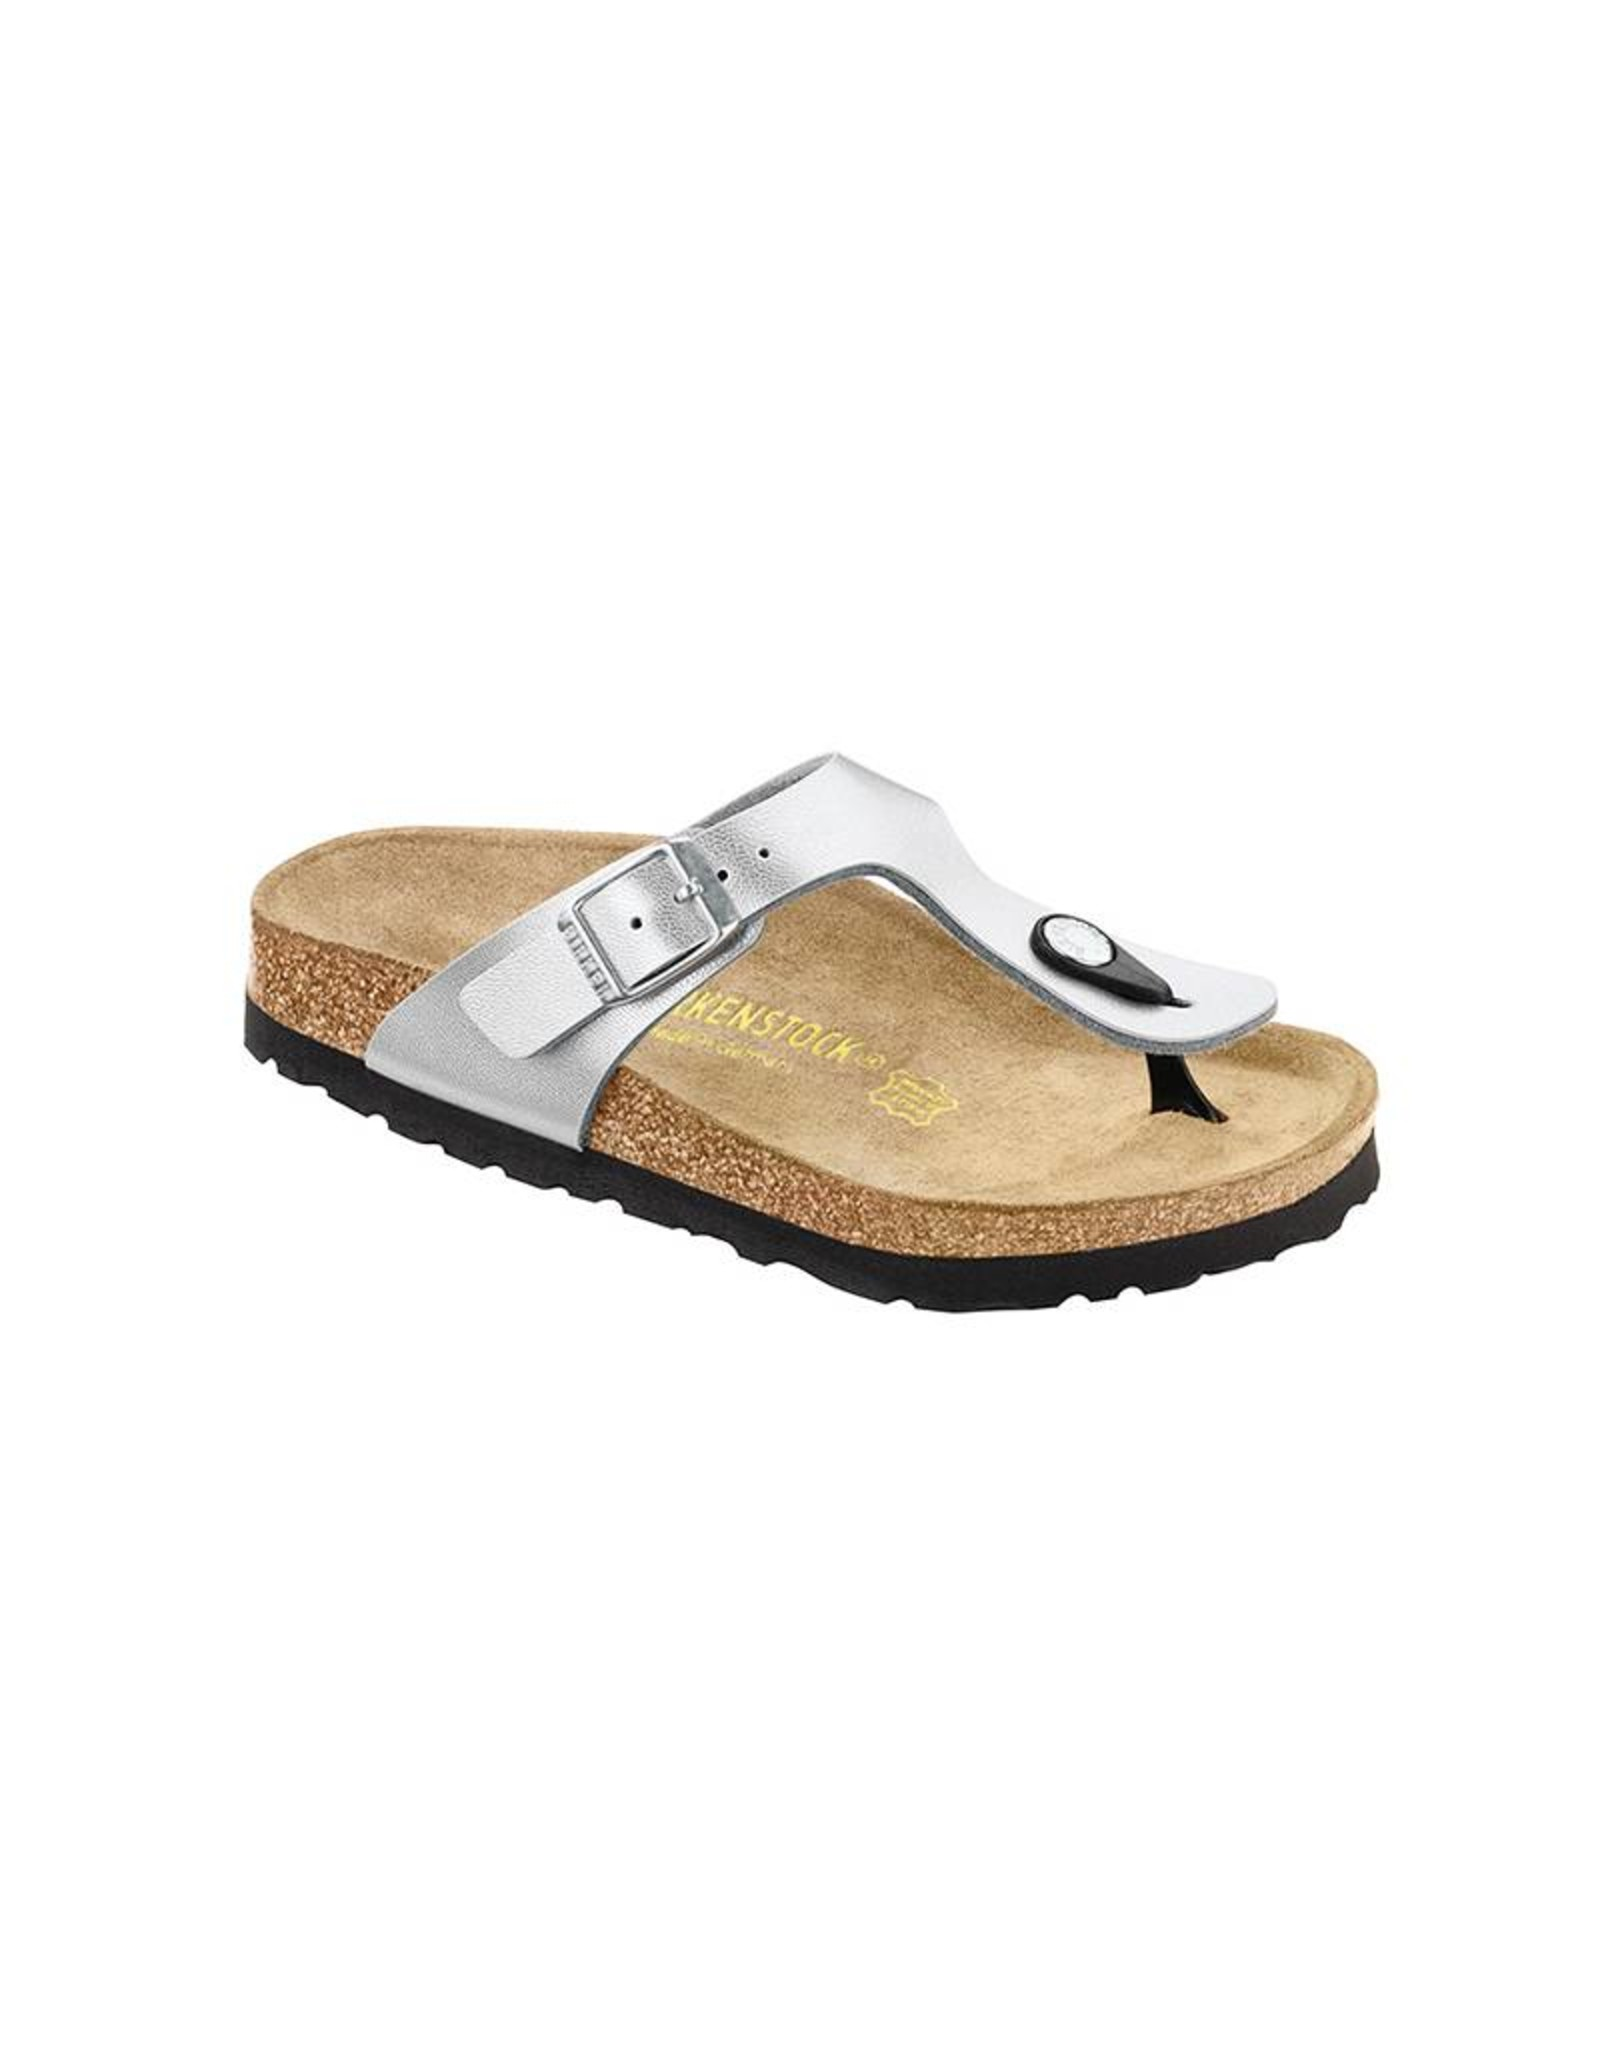 Buy Birkenstock Kids Gizeh Sandals in